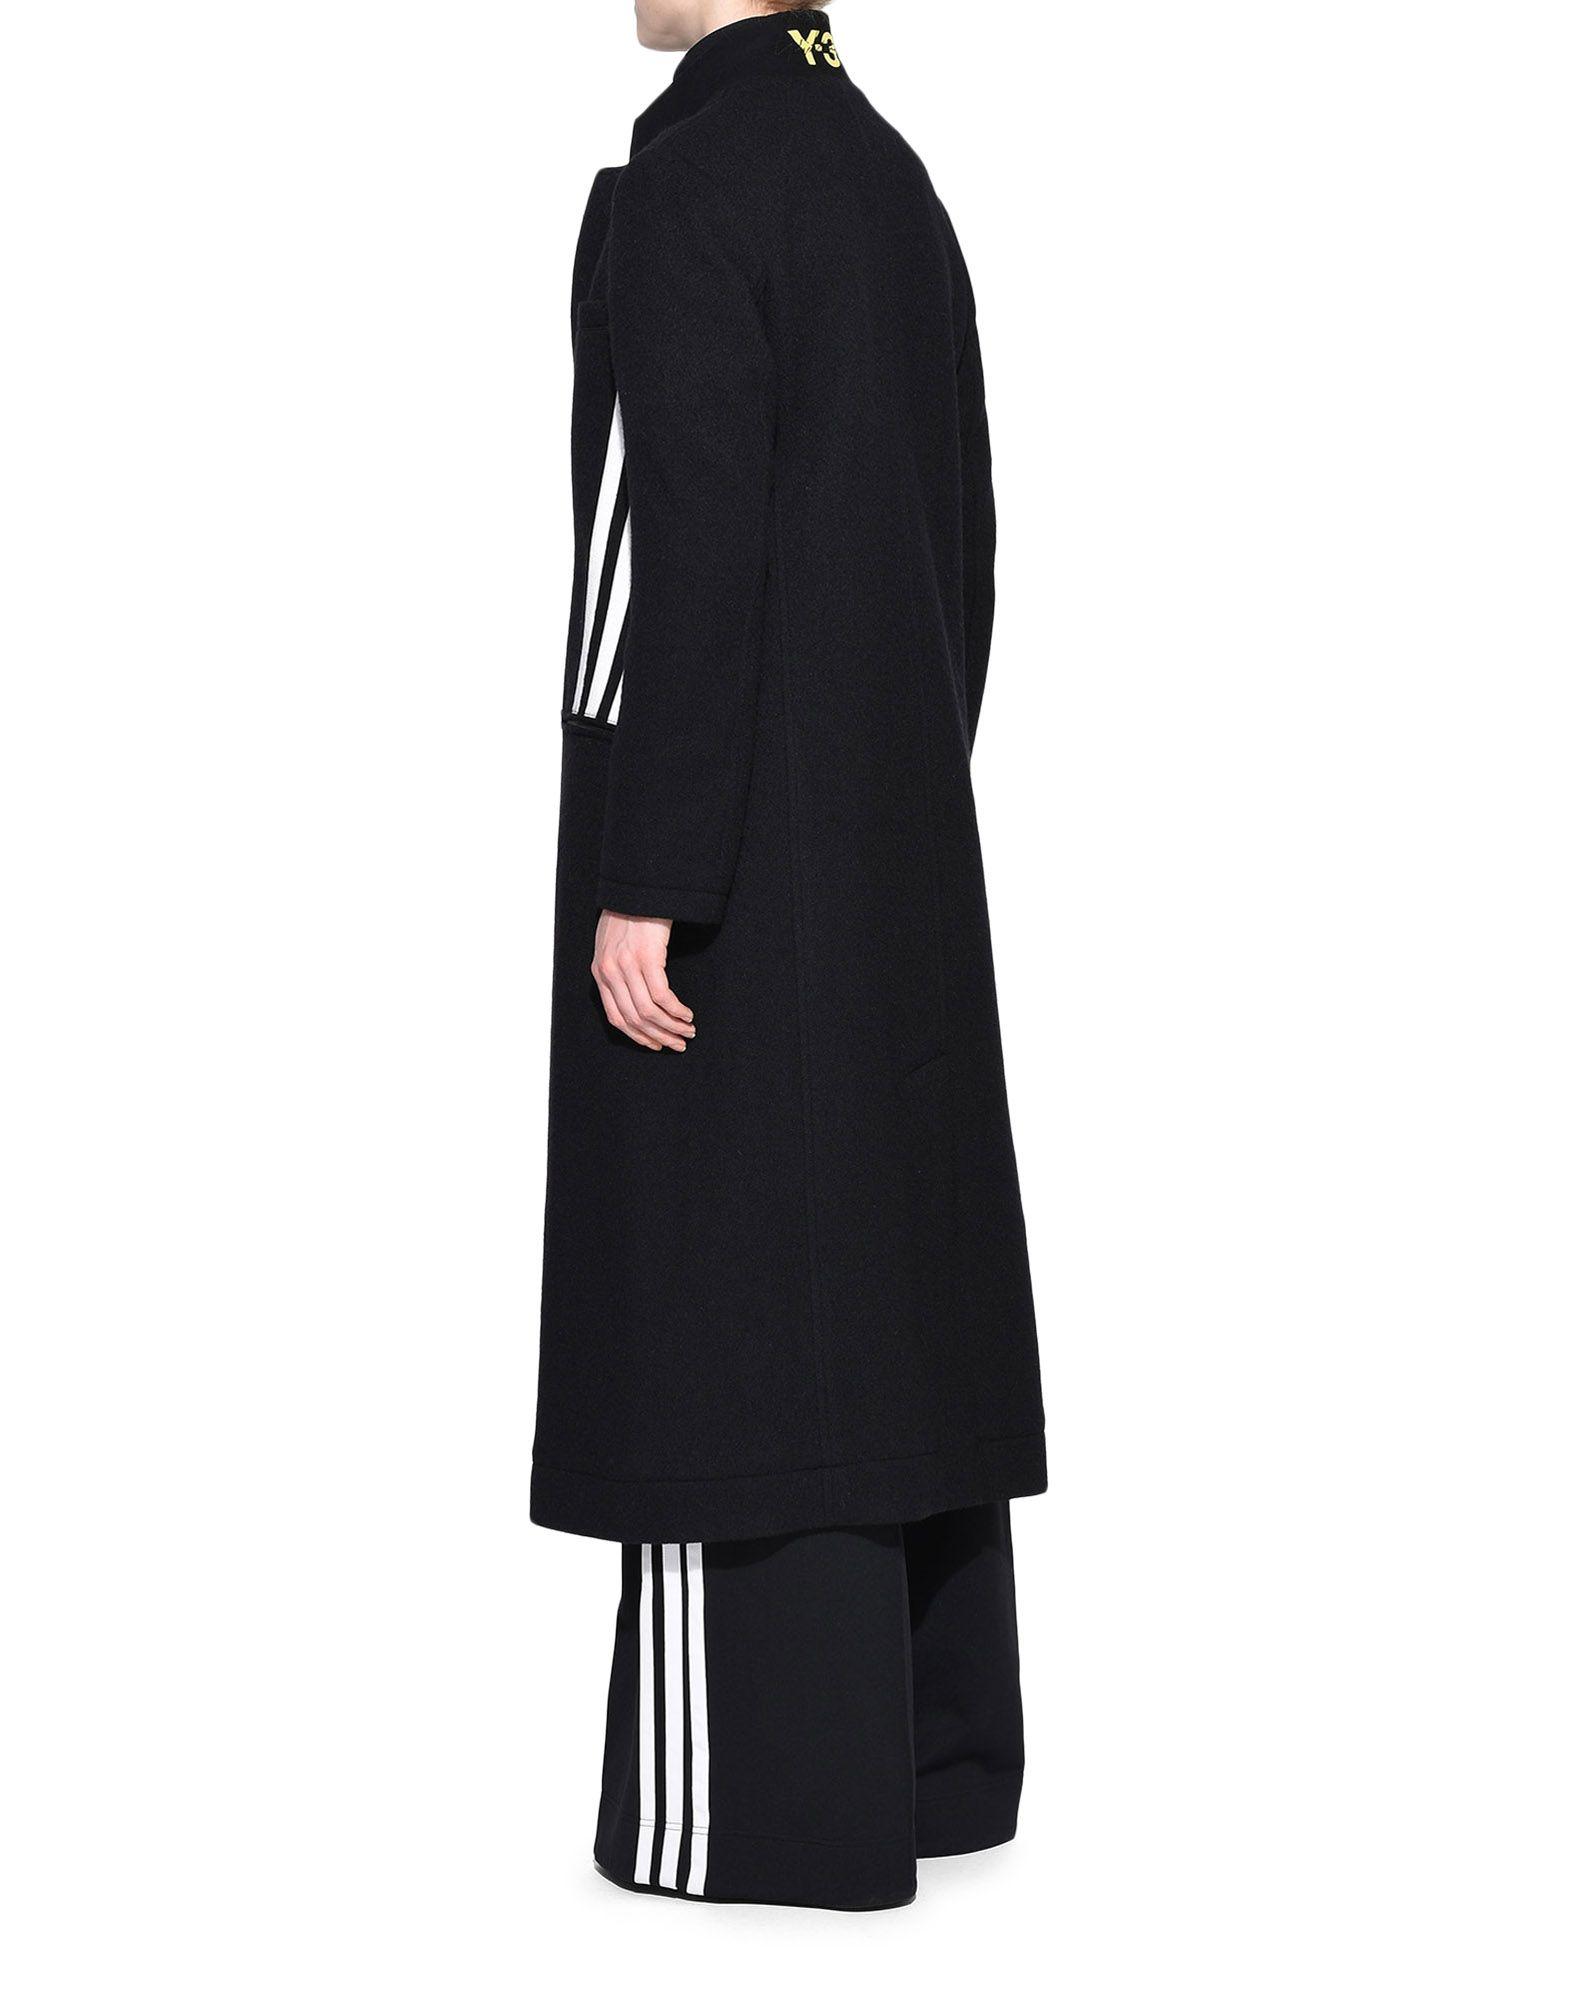 Y-3 Y-3 3-Stripes Tailored Wool Coat フォーマルジャケット レディース e